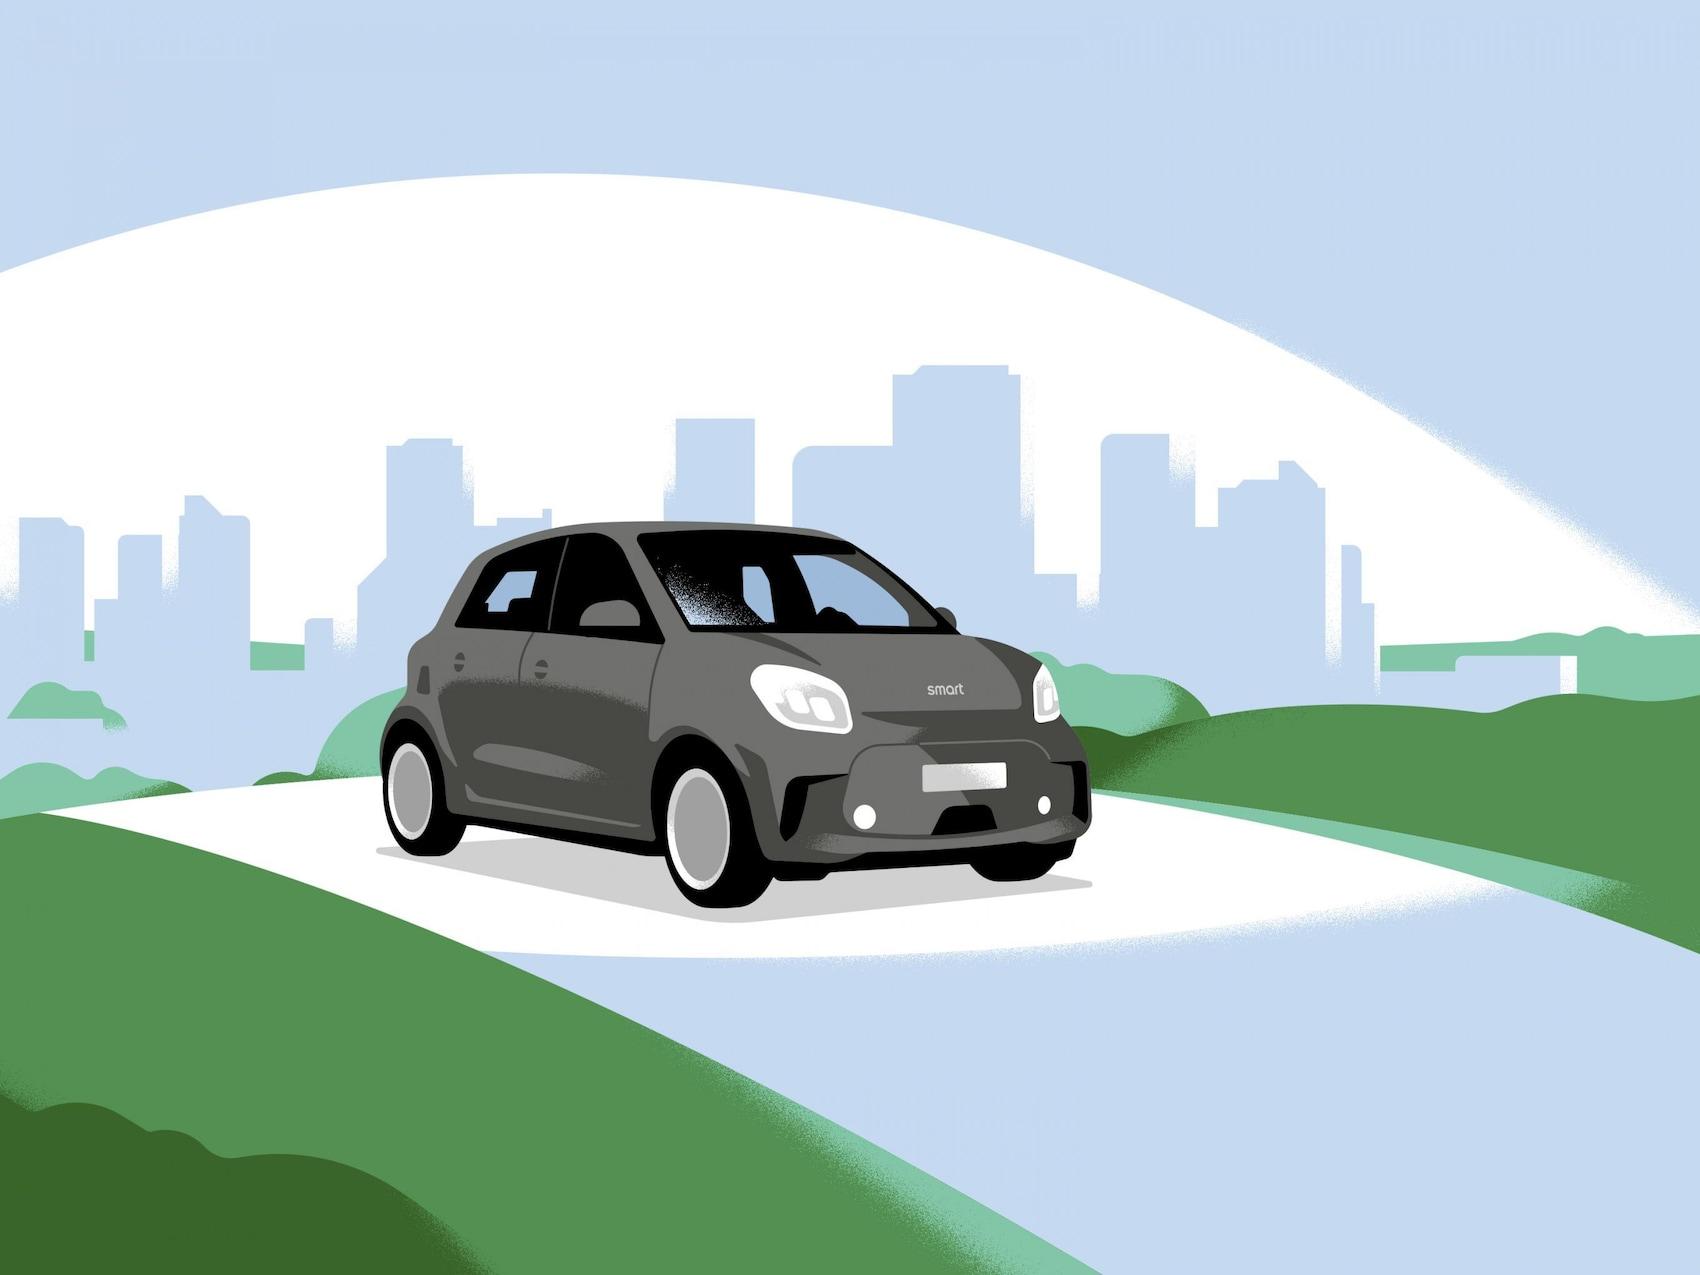 smart EQ leaving the city